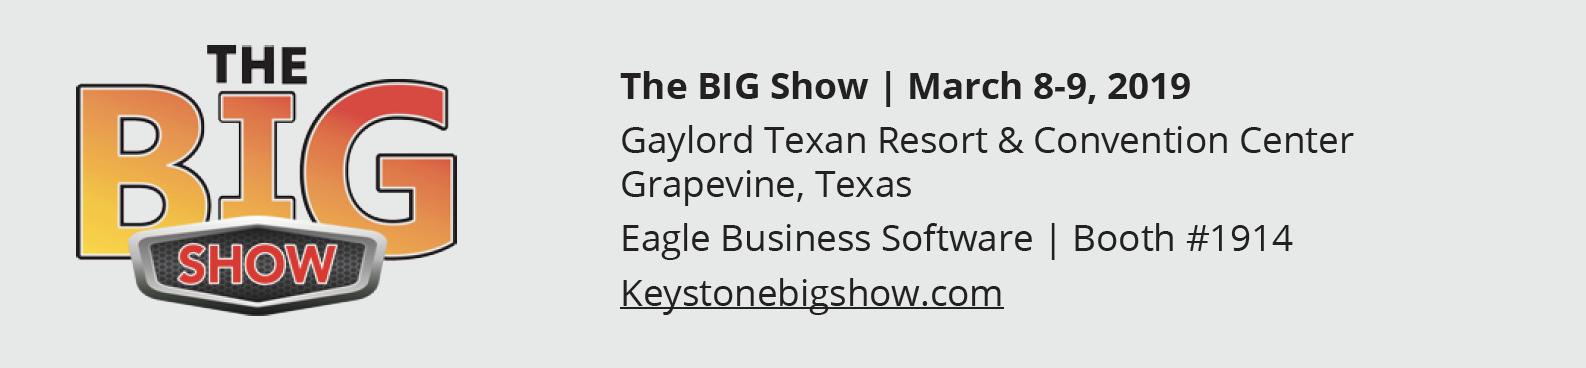 Keystone BIG Show 2019 Details